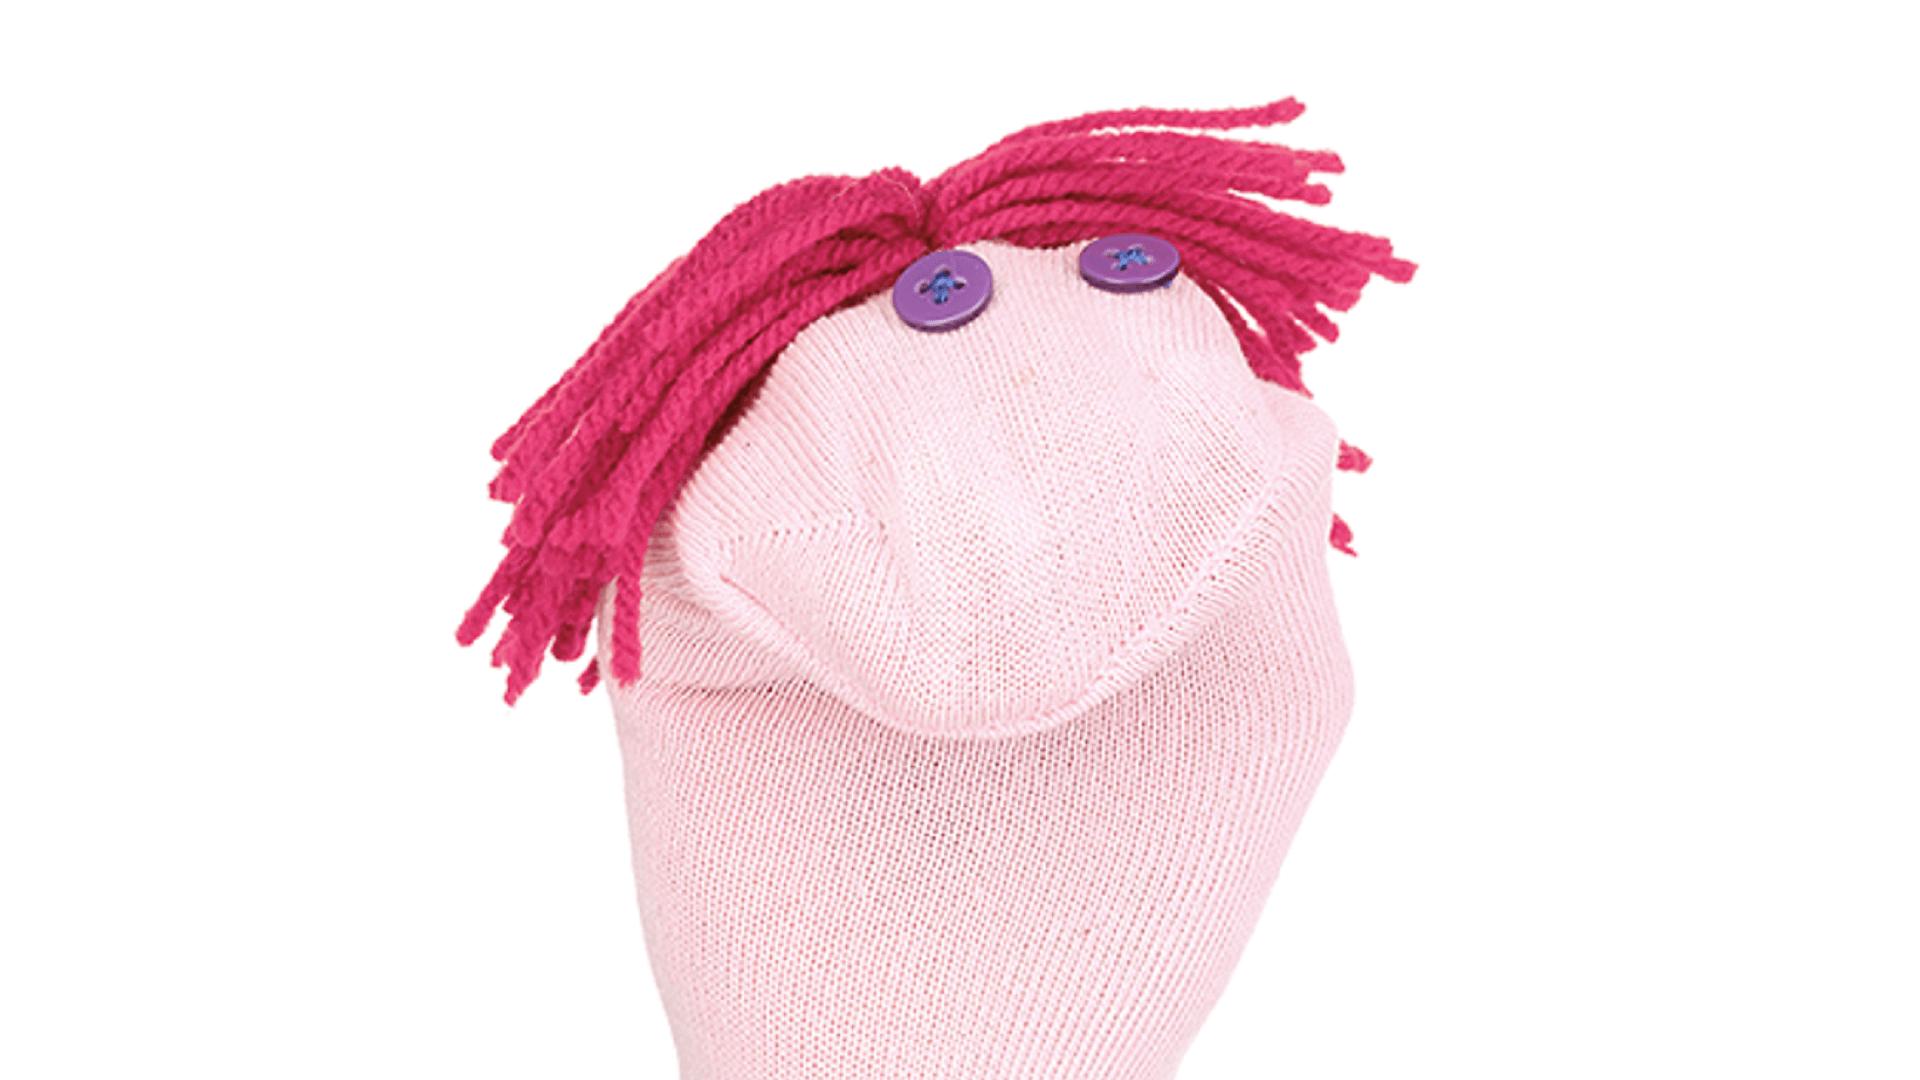 Using Sock Puppet Accounts for OSINT